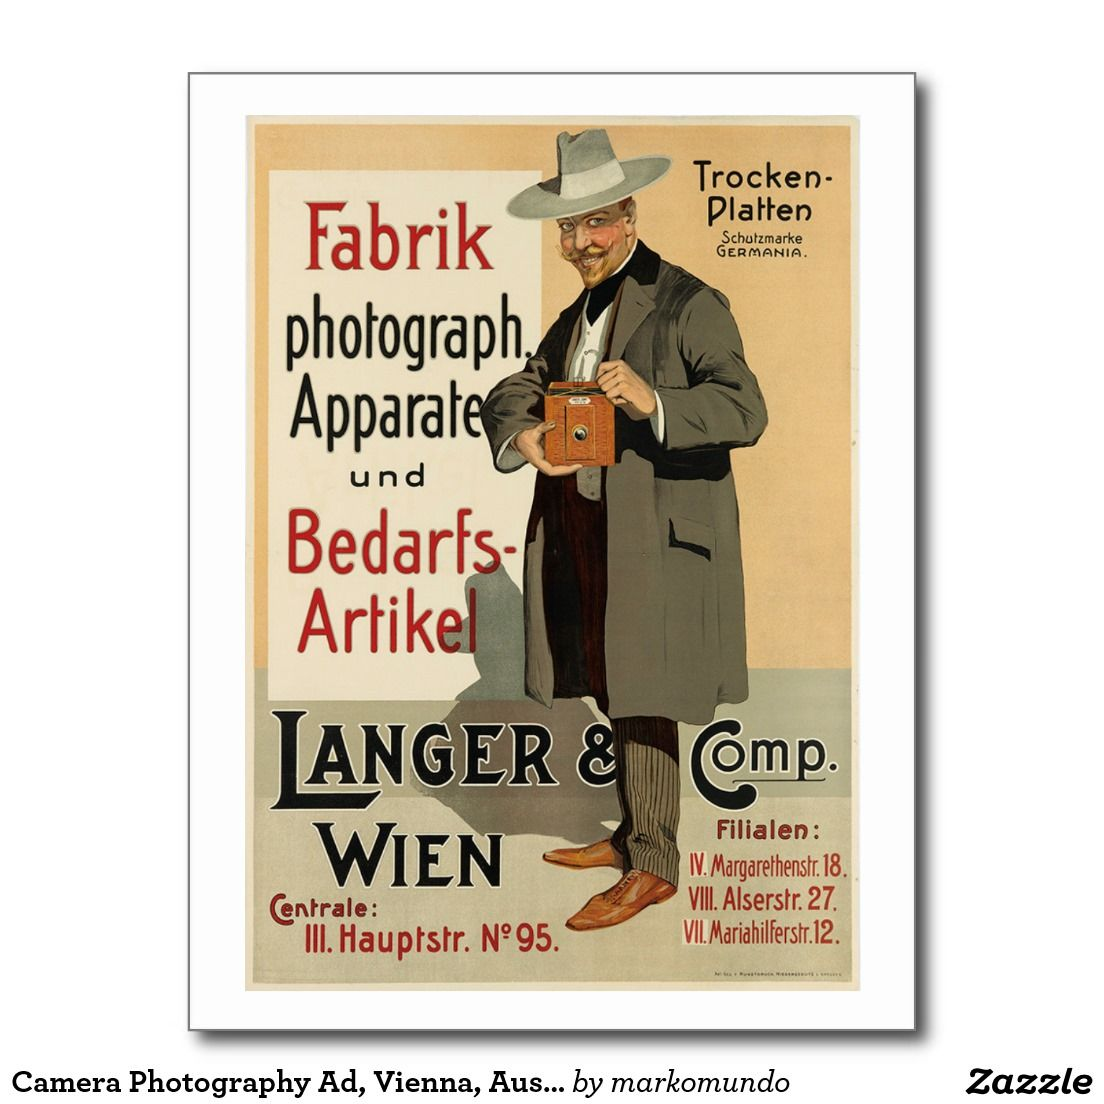 Camera Photography Ad, Vienna, Austria Vintage Postcard